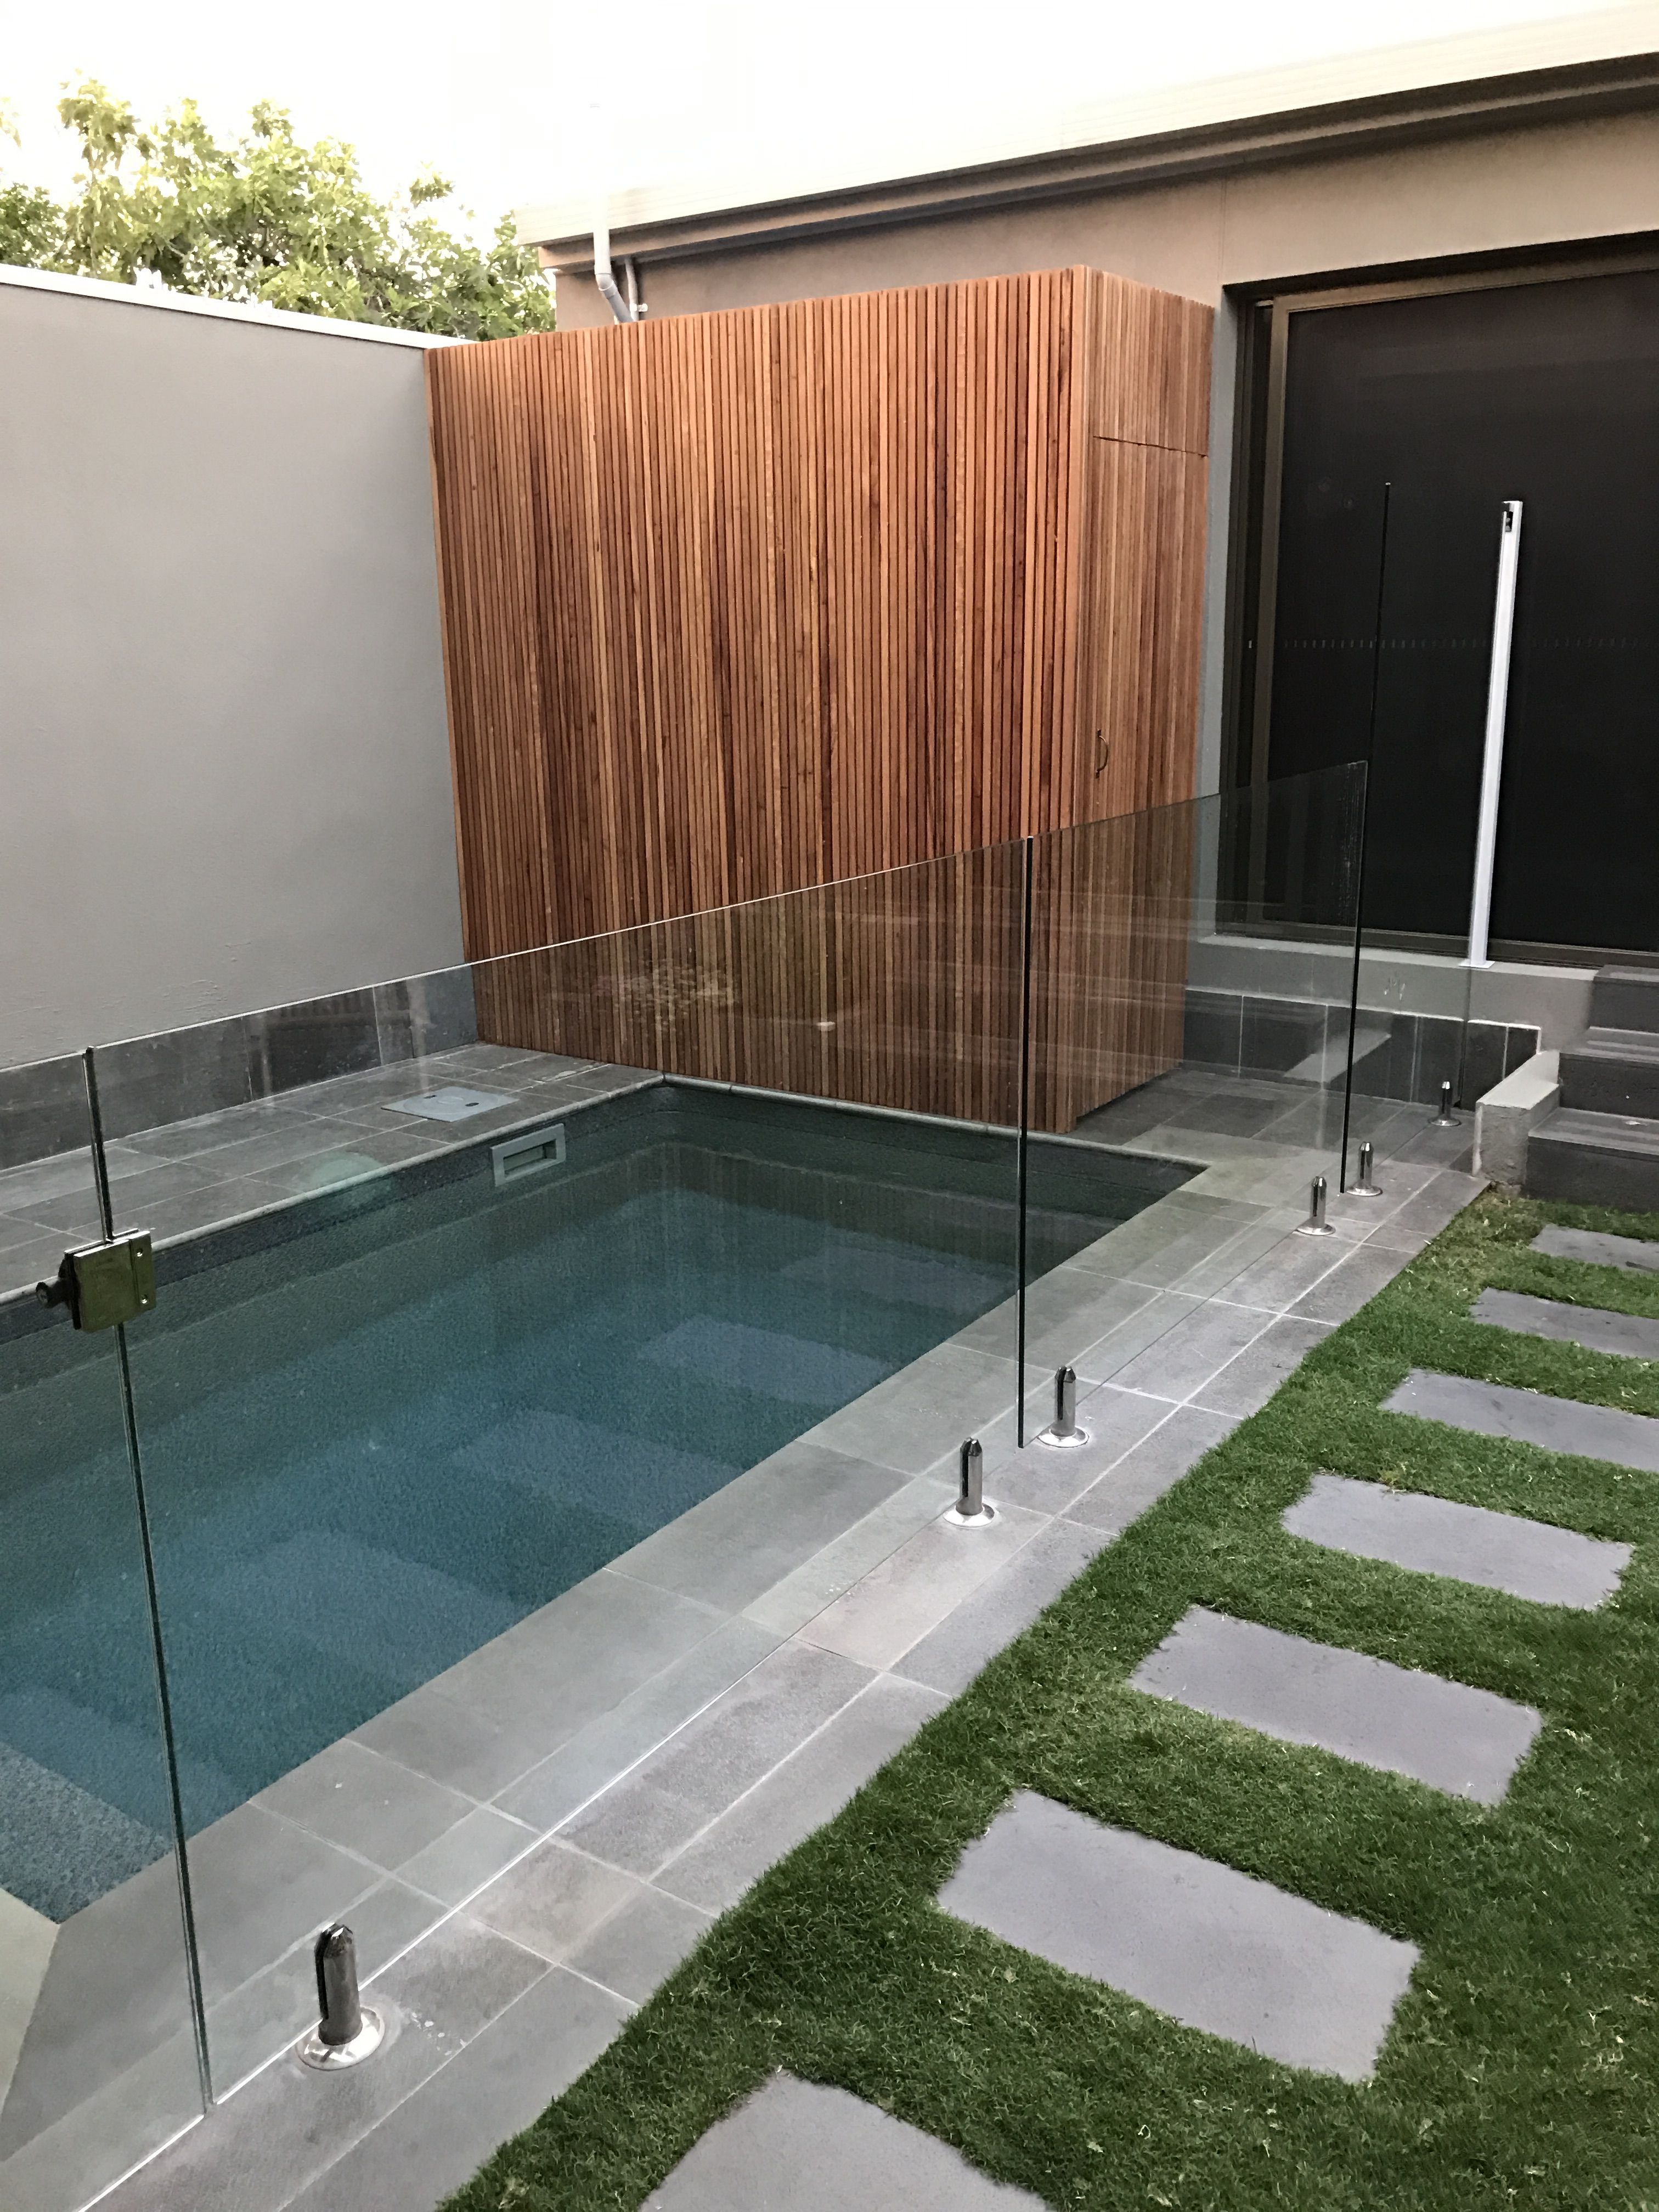 Pool equipment enclosure screen Wood Blackbutt ecotimber small pool ...